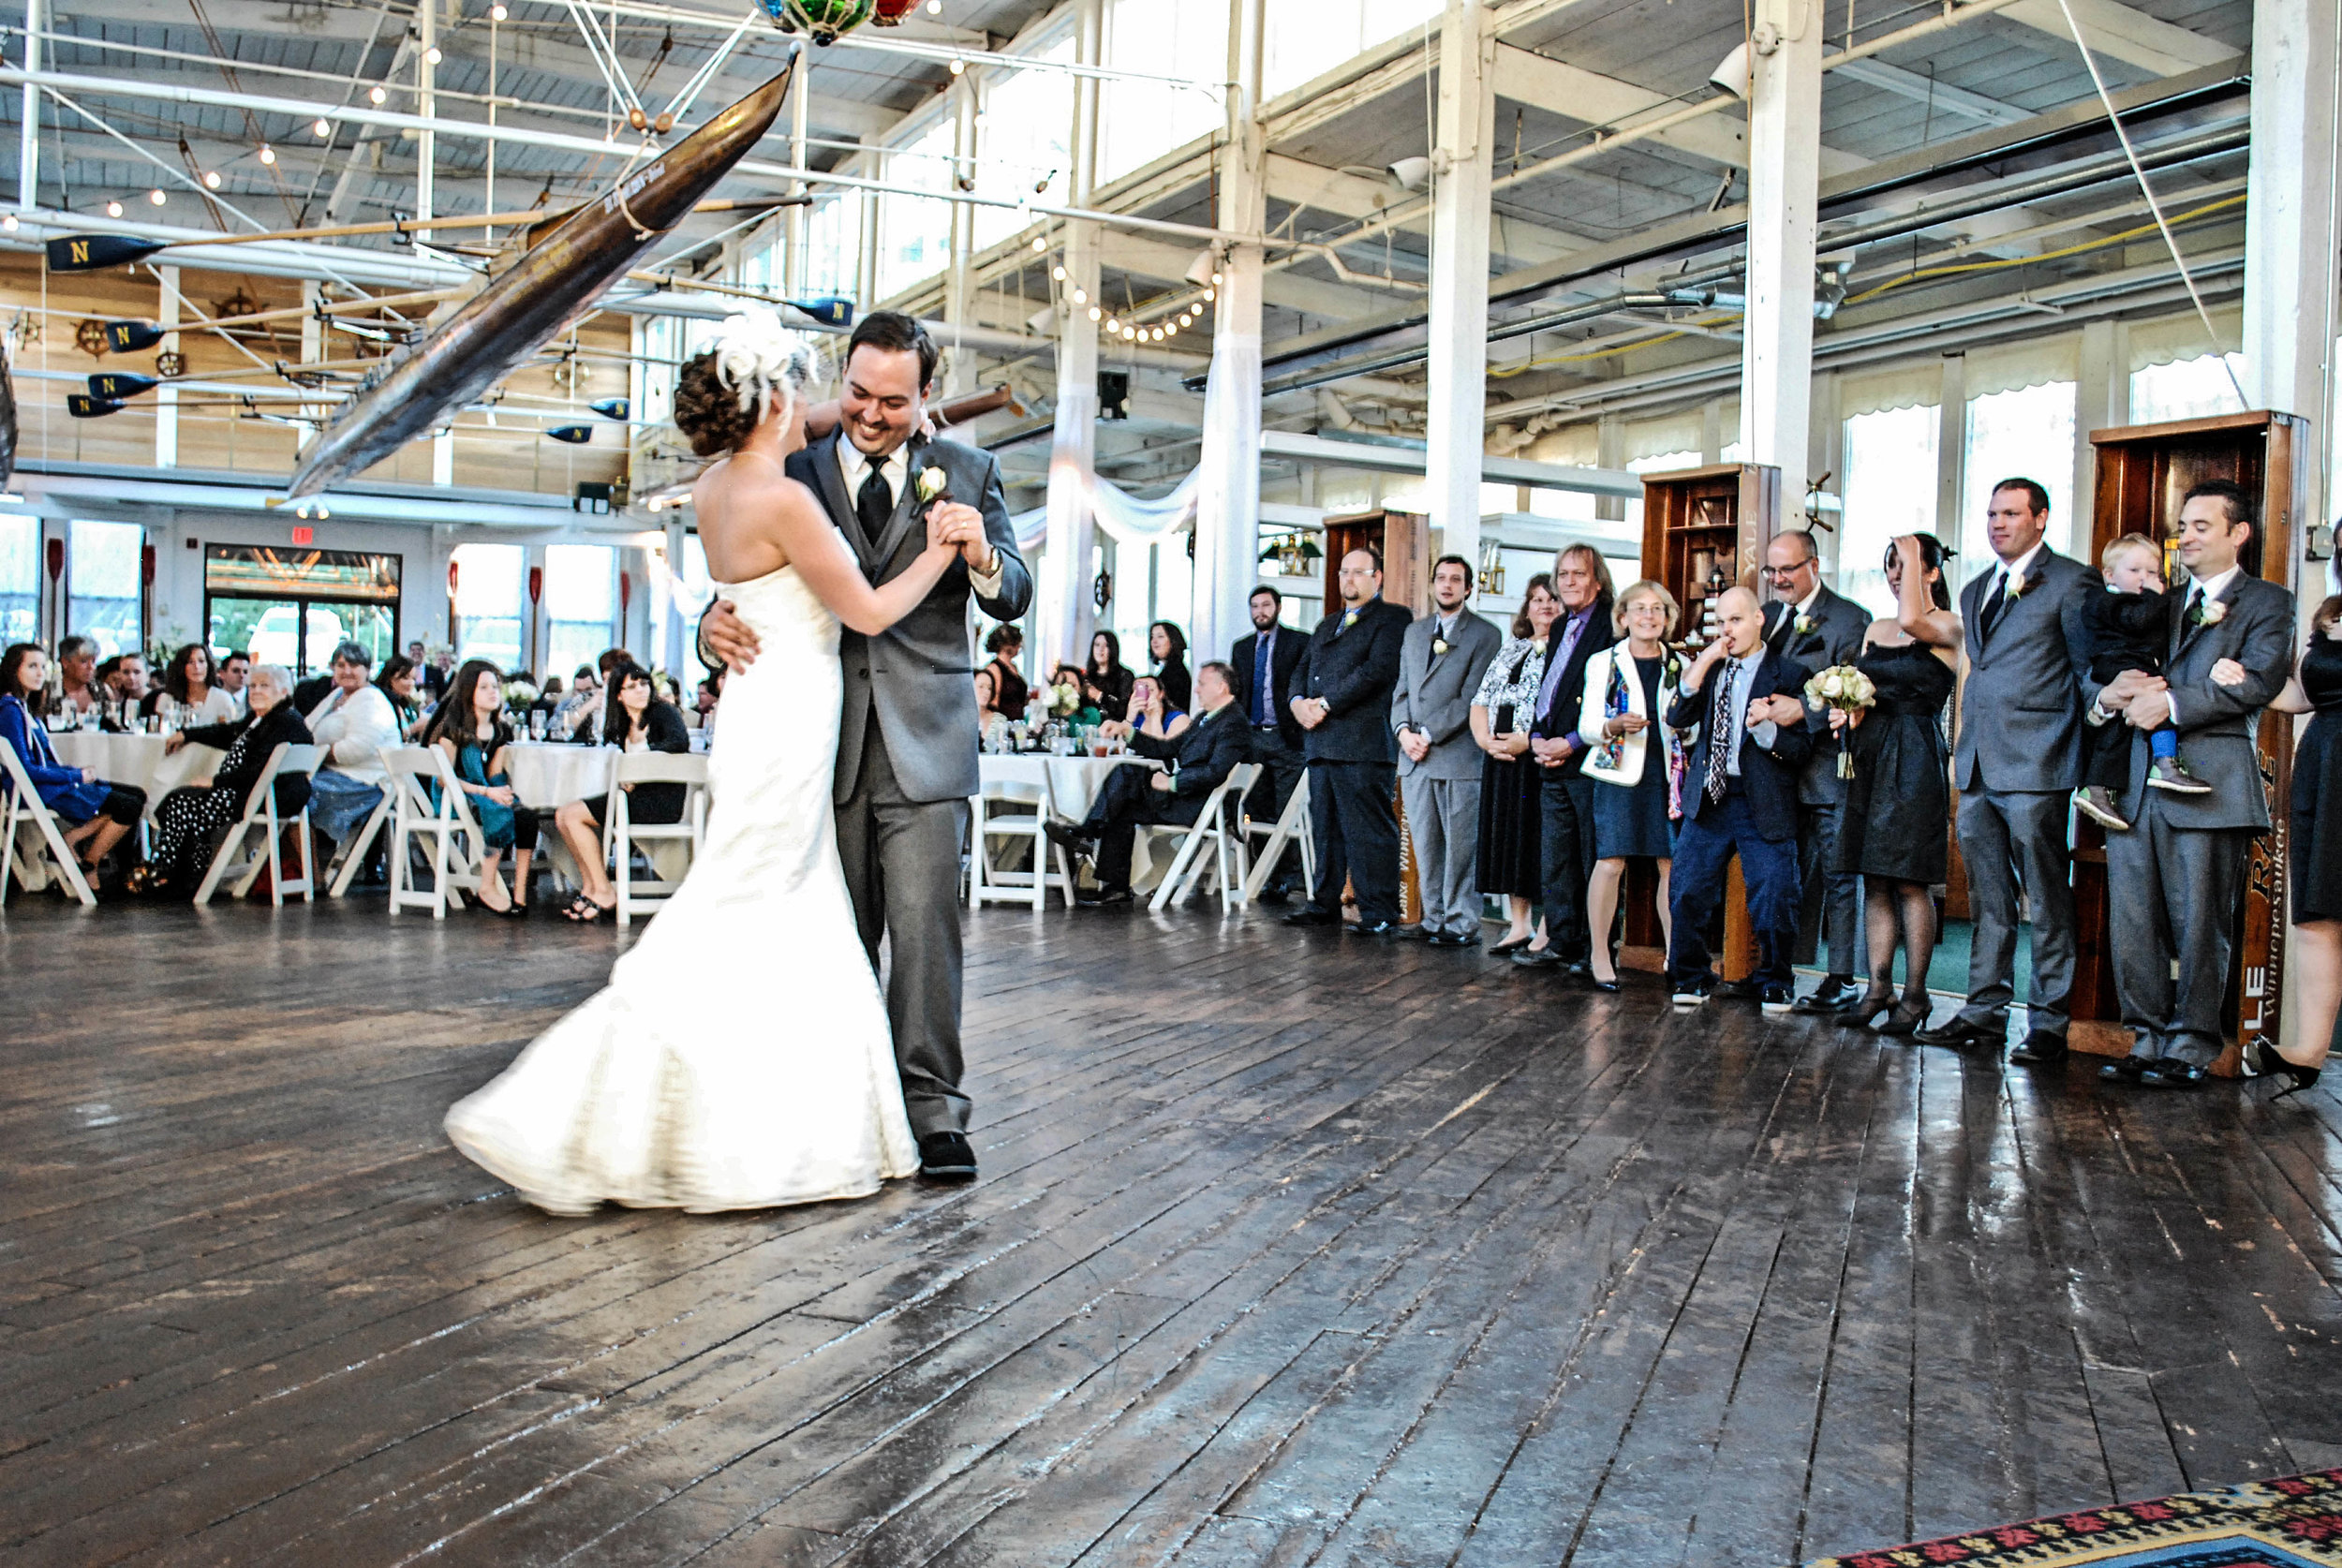 Erica & Matt's Wedding | October 2013